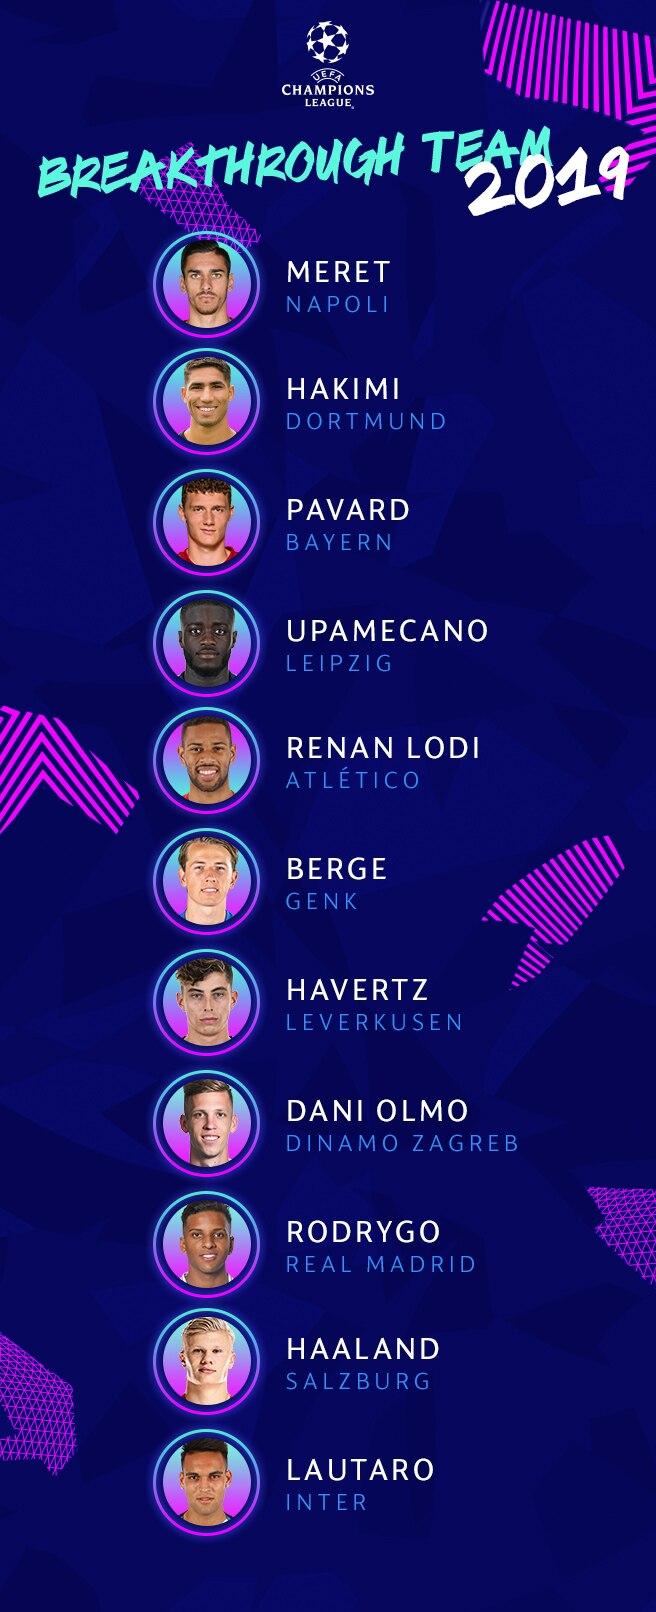 2019 UEFA Champions League breakthrough team